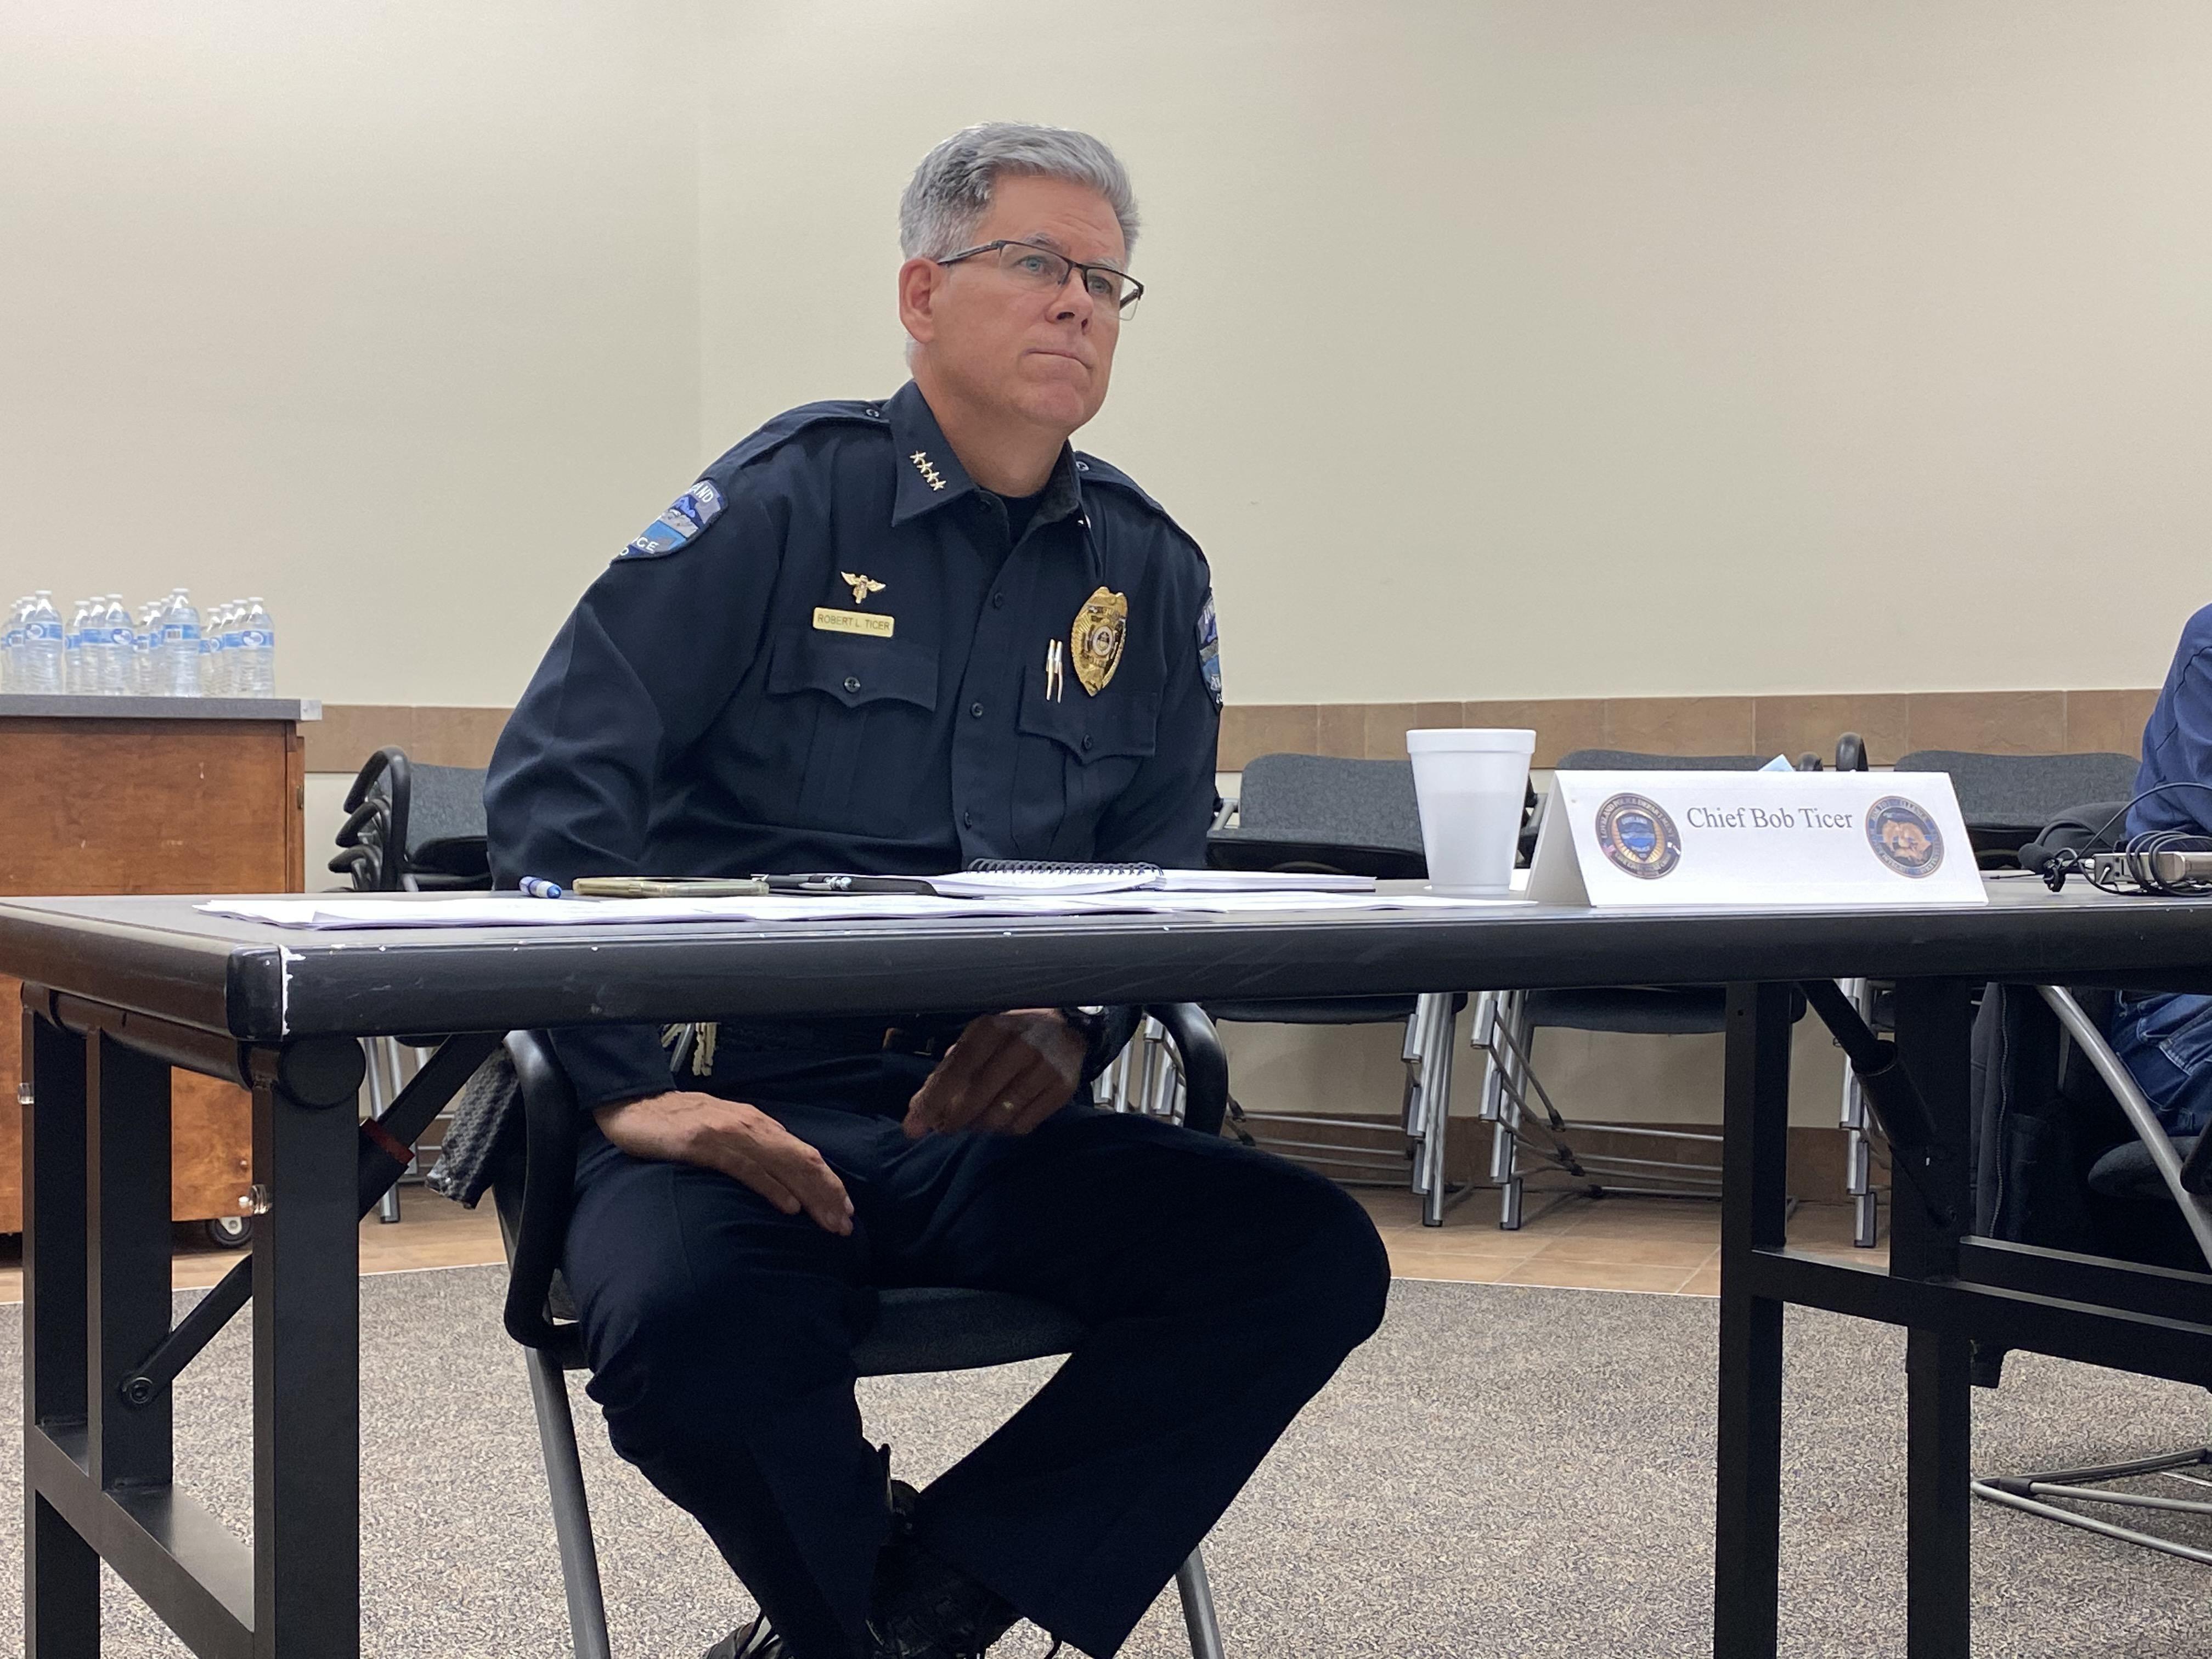 Loveland Police Chief Robert Ticer